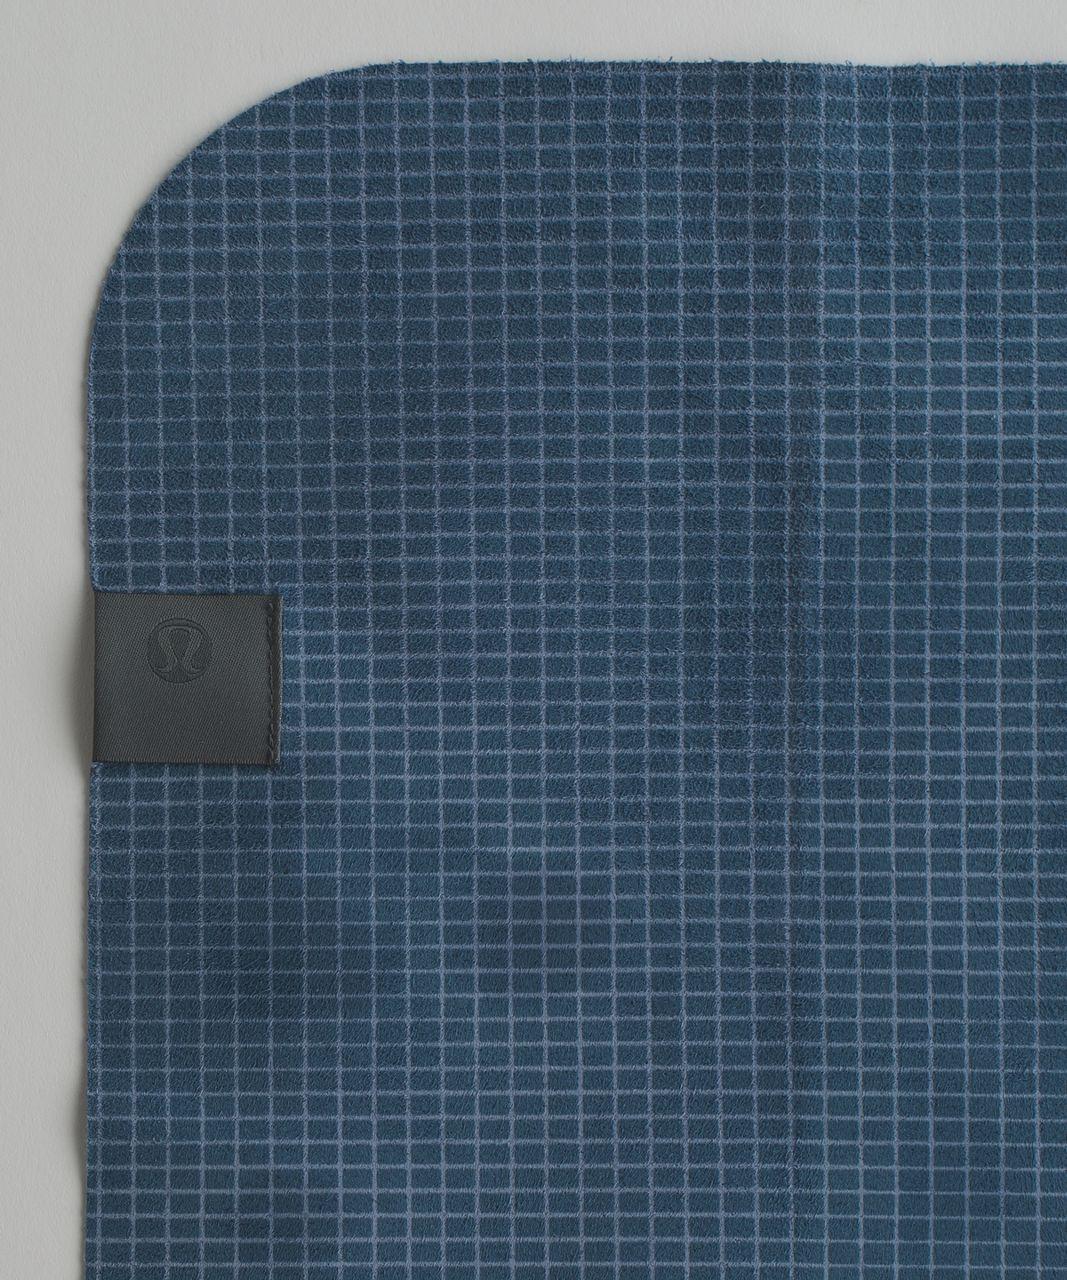 Lululemon The (Small) Towel - Off Grid Tempest Blue Hawk Blue